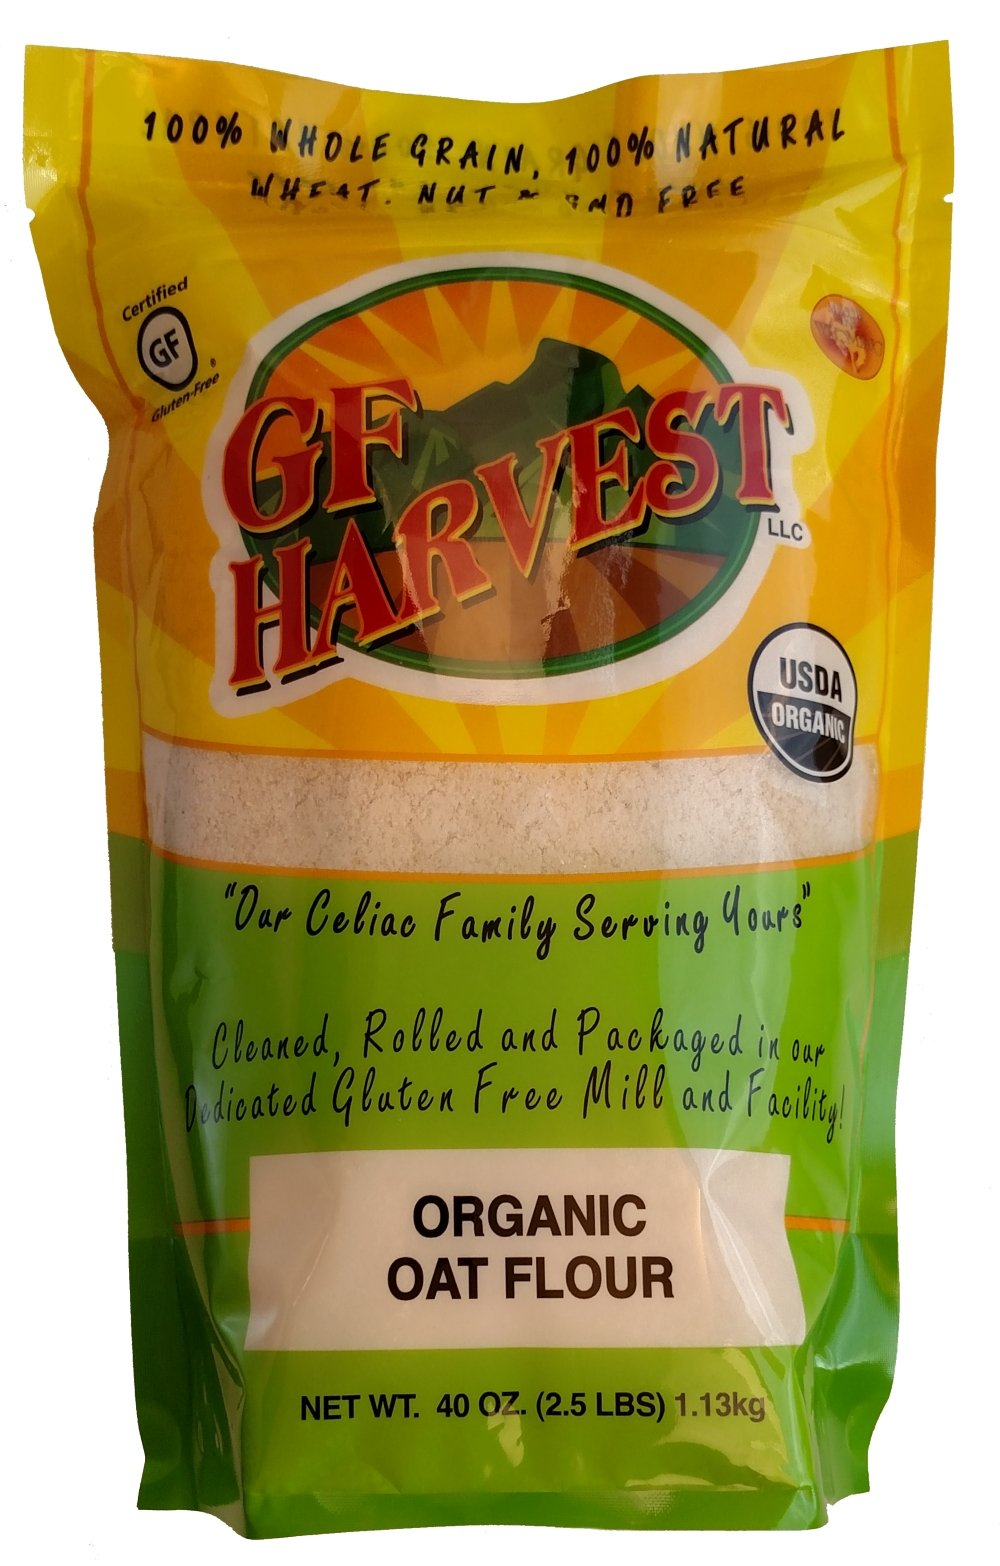 Amazon.com: GF Harvest Organic Quick Oats, Gluten Free, 41